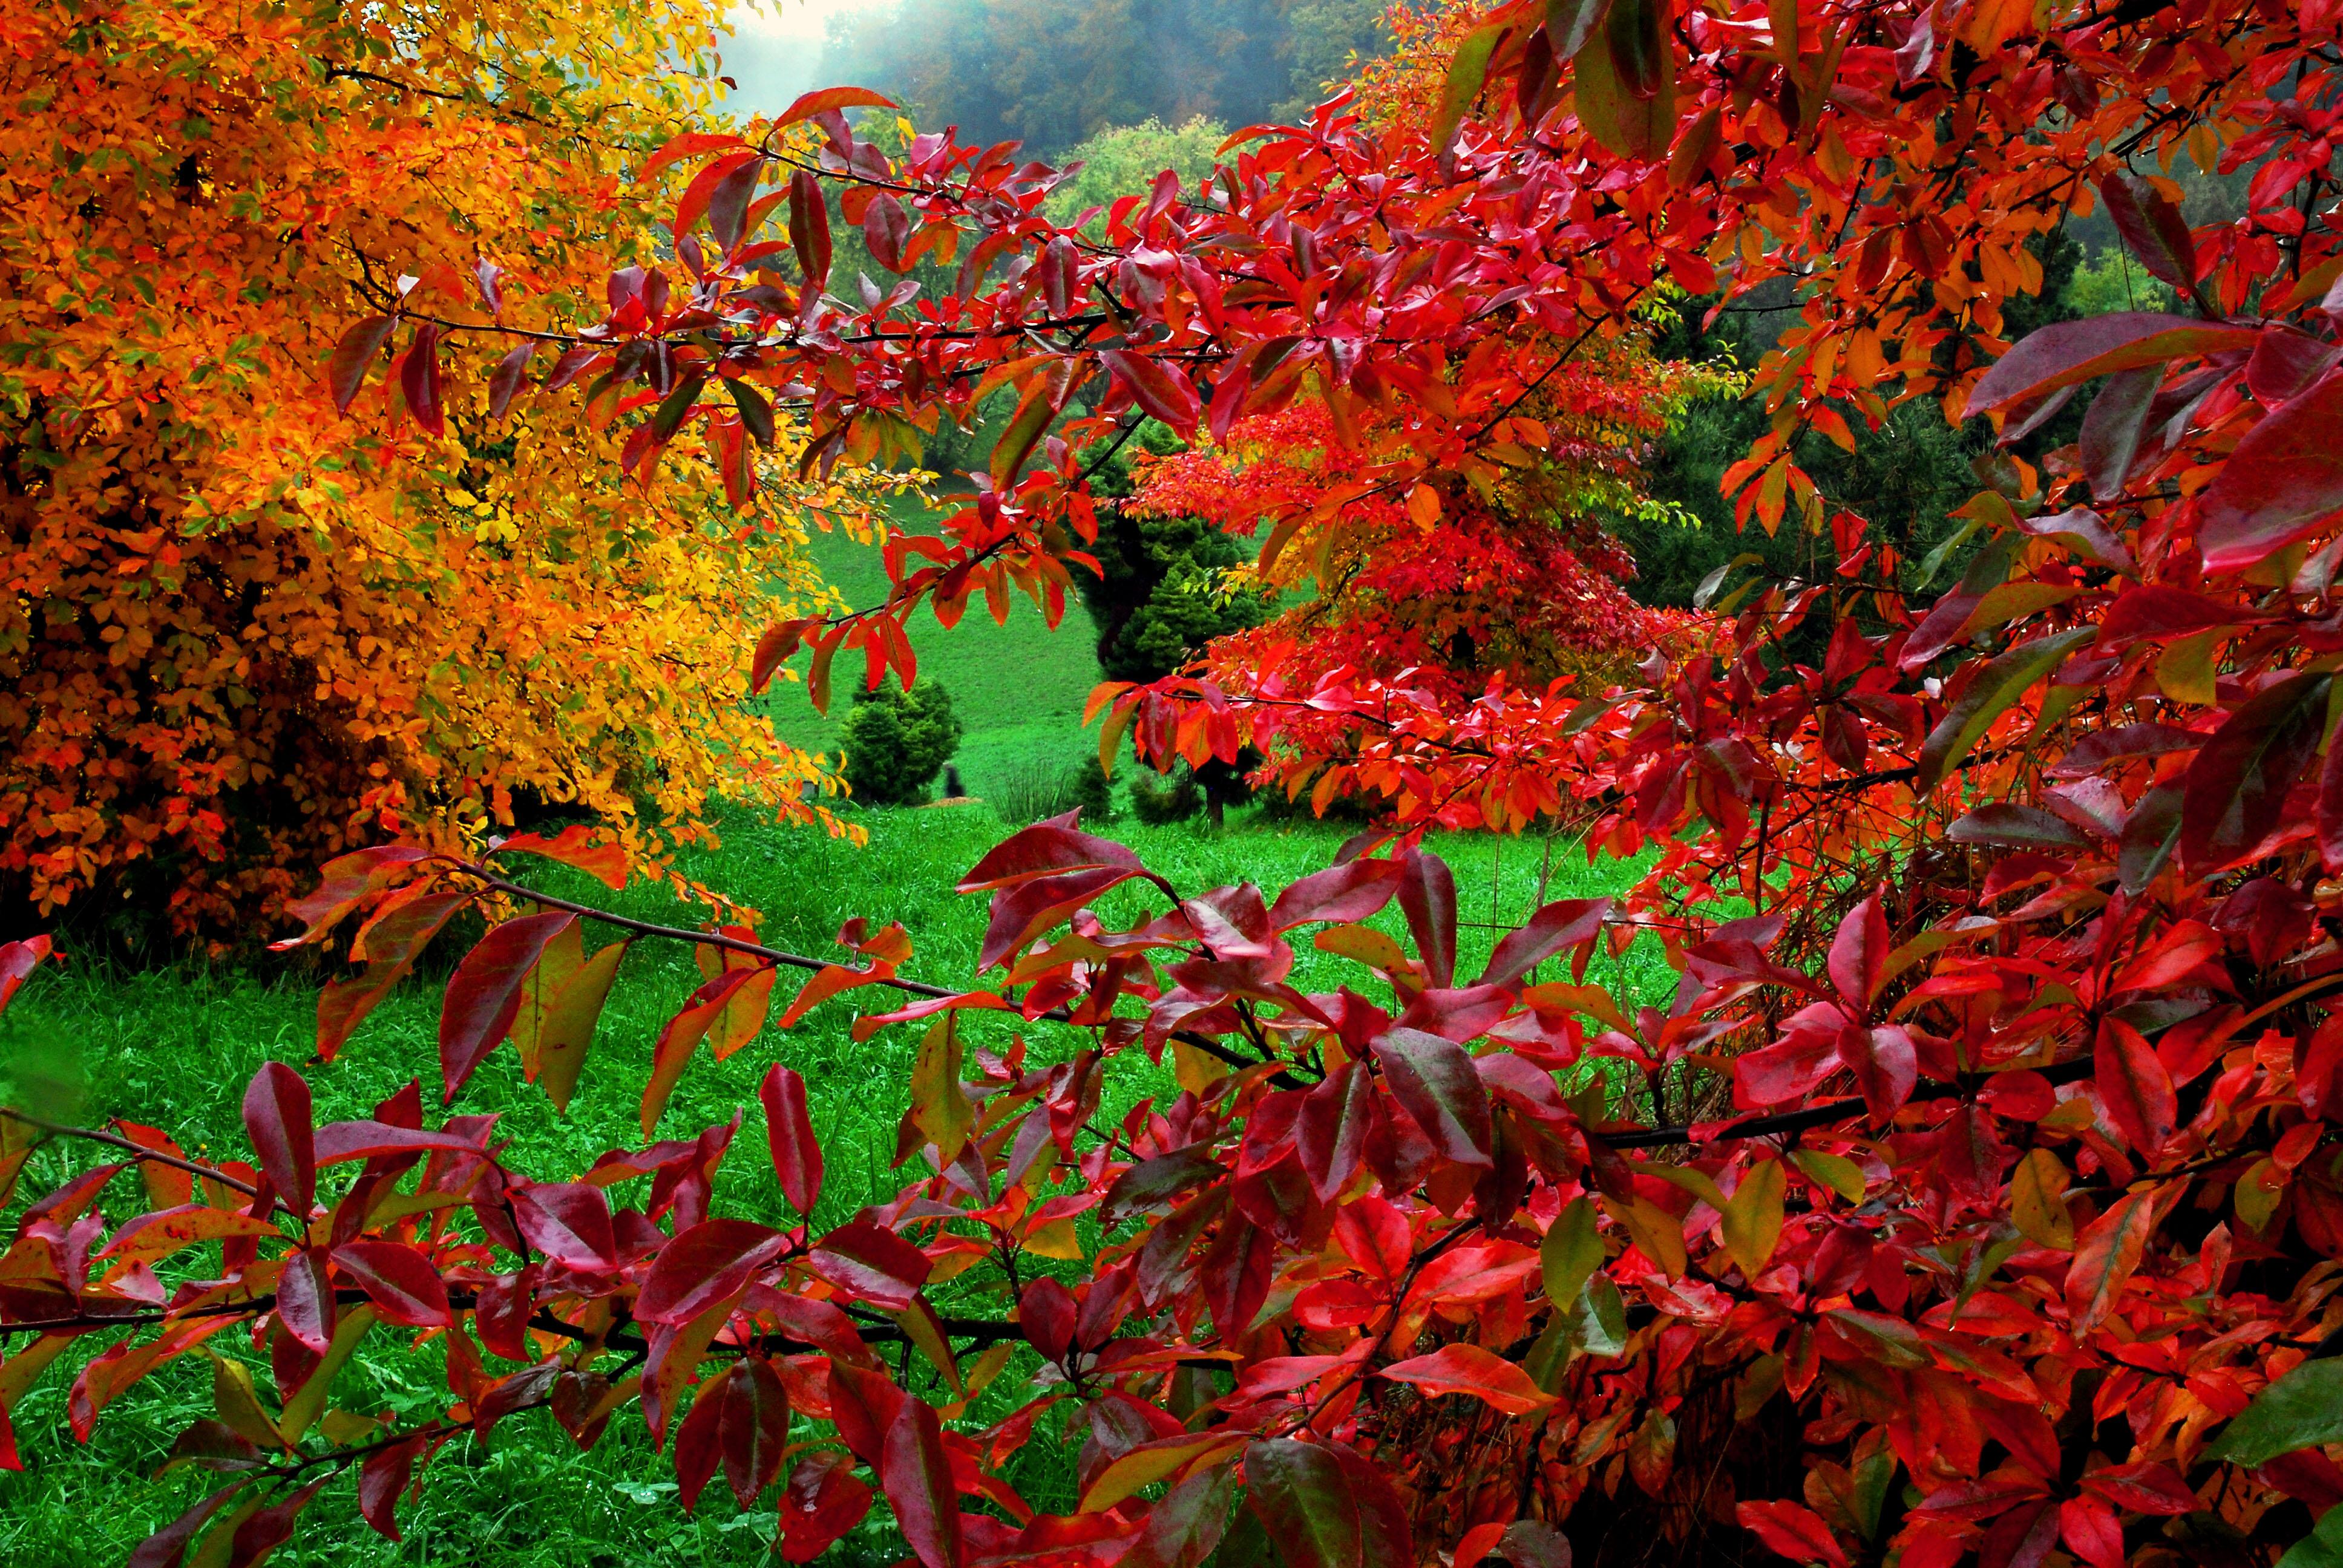 Wallpaper Nature Vegetation Autumn Flora Deciduous